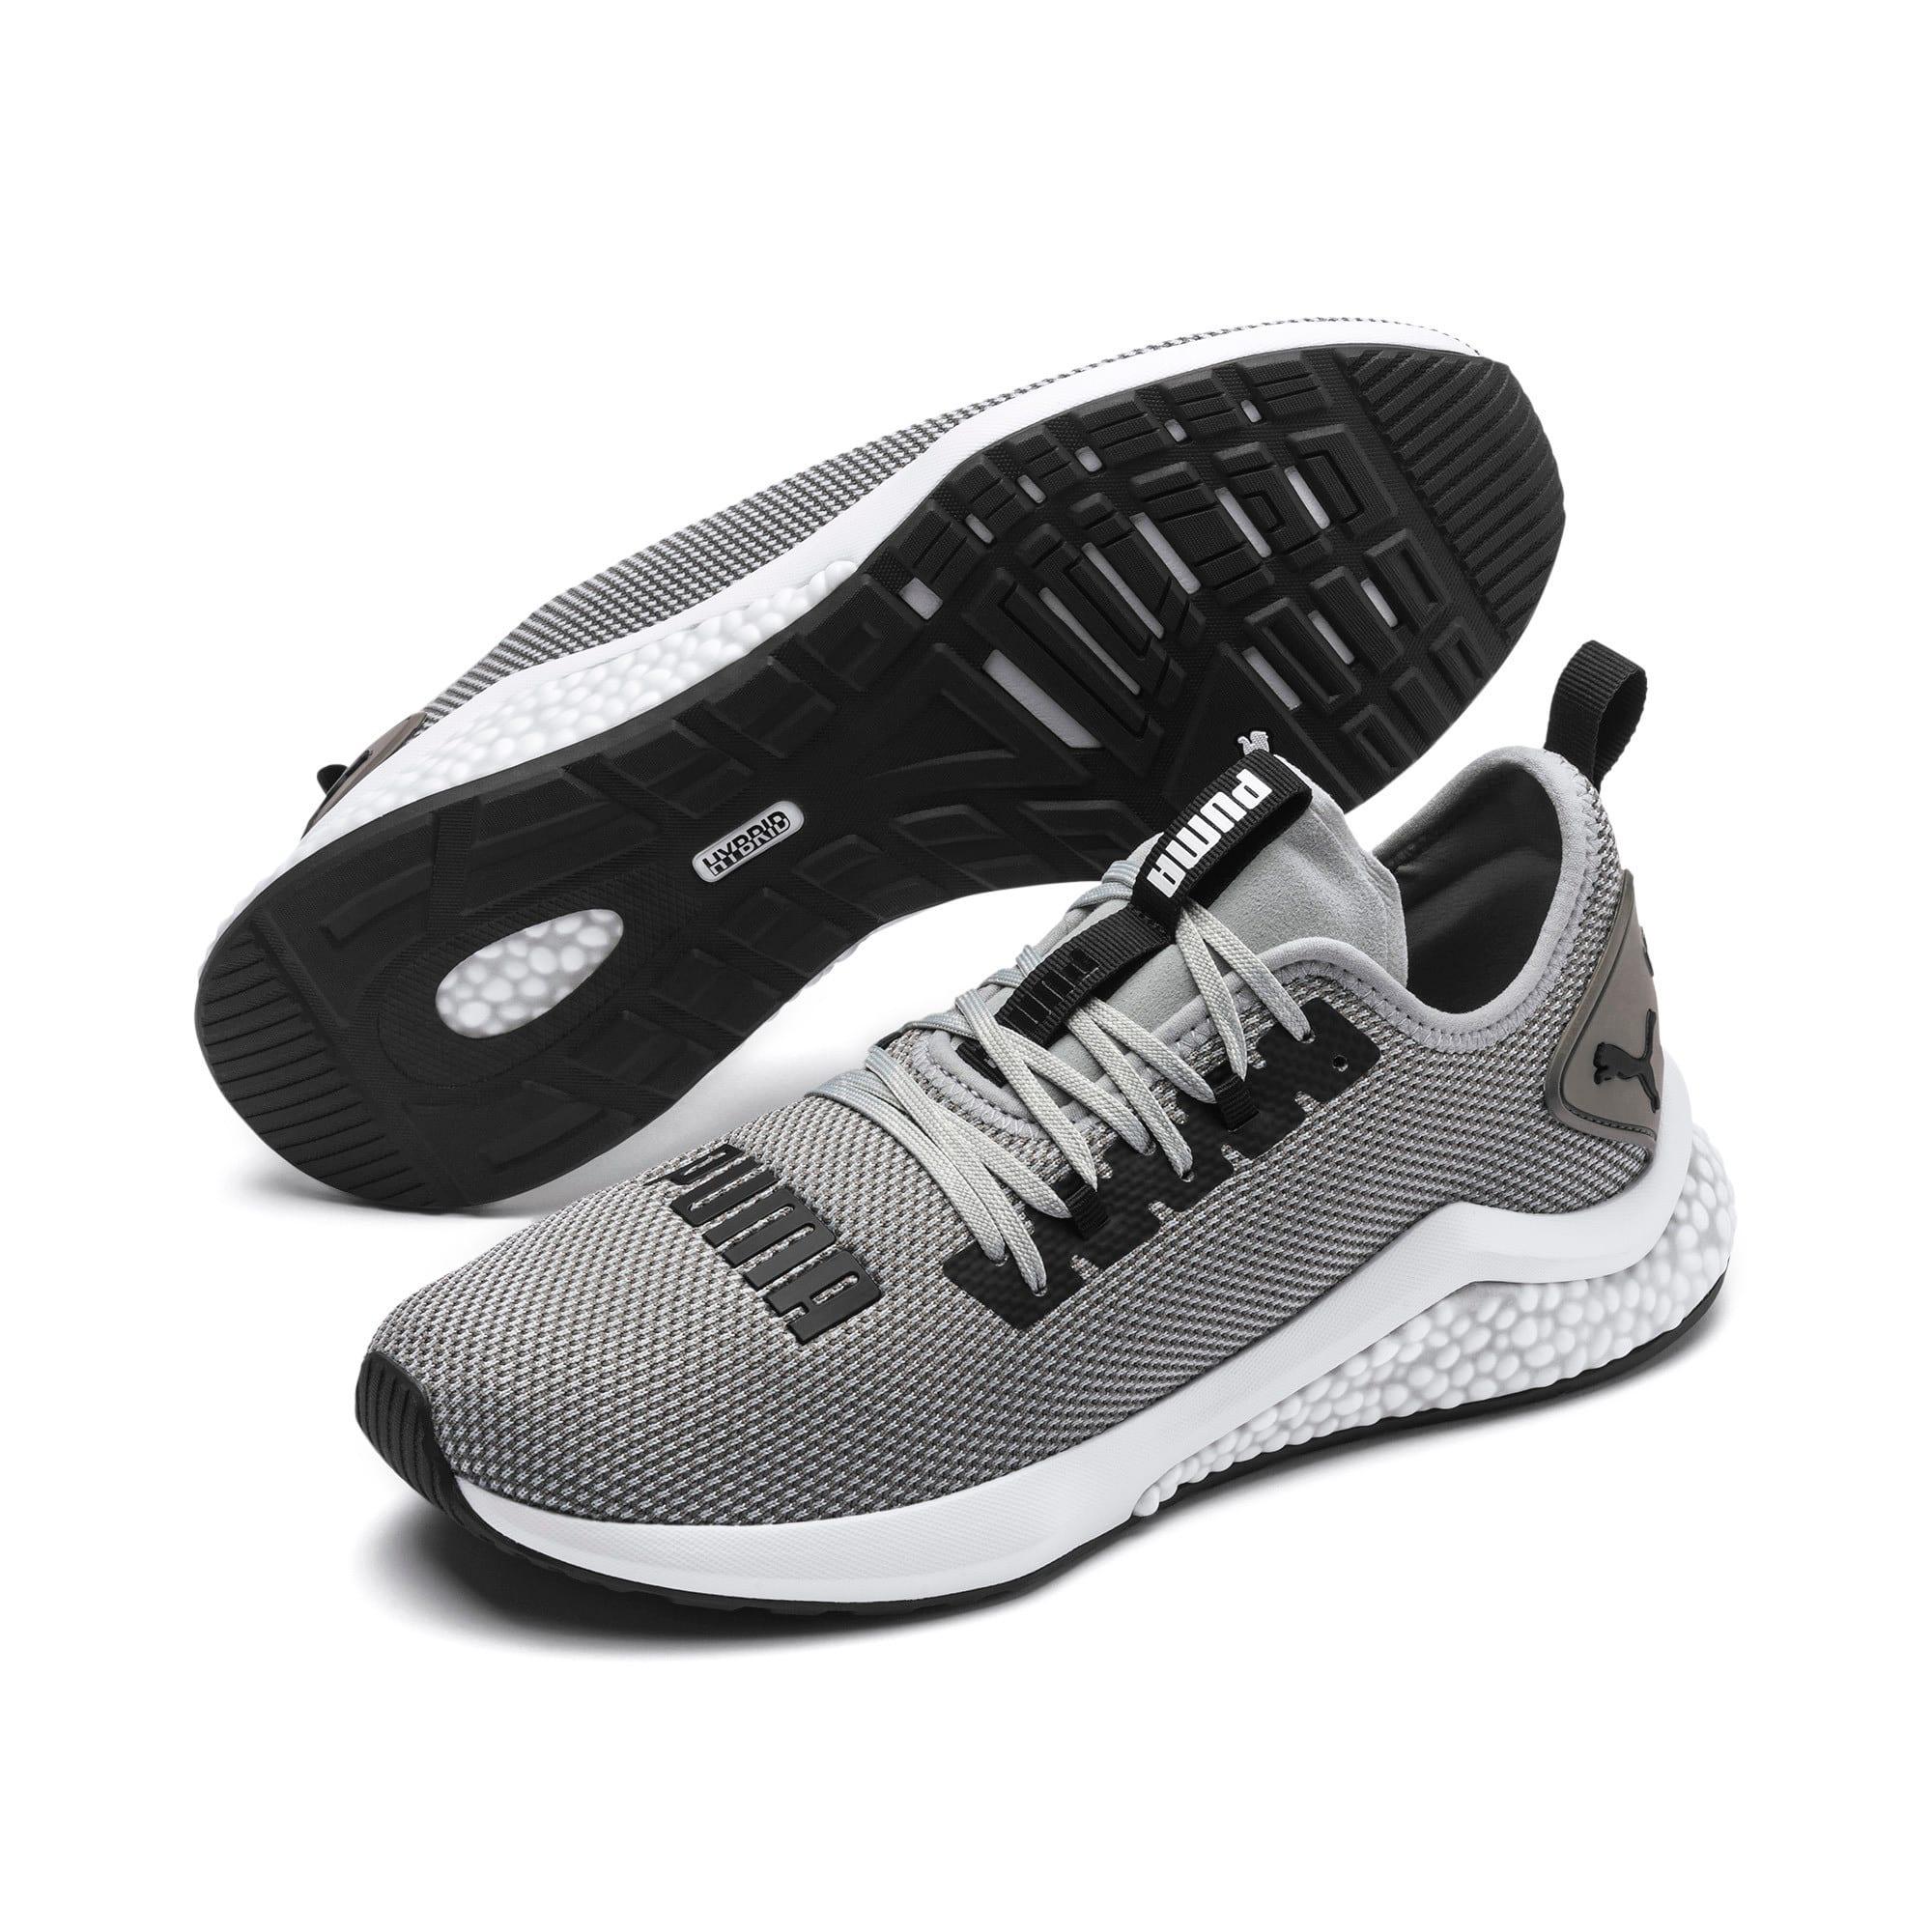 Thumbnail 2 of HYBRID NX Men's Running Shoes, Quarry-Puma White, medium